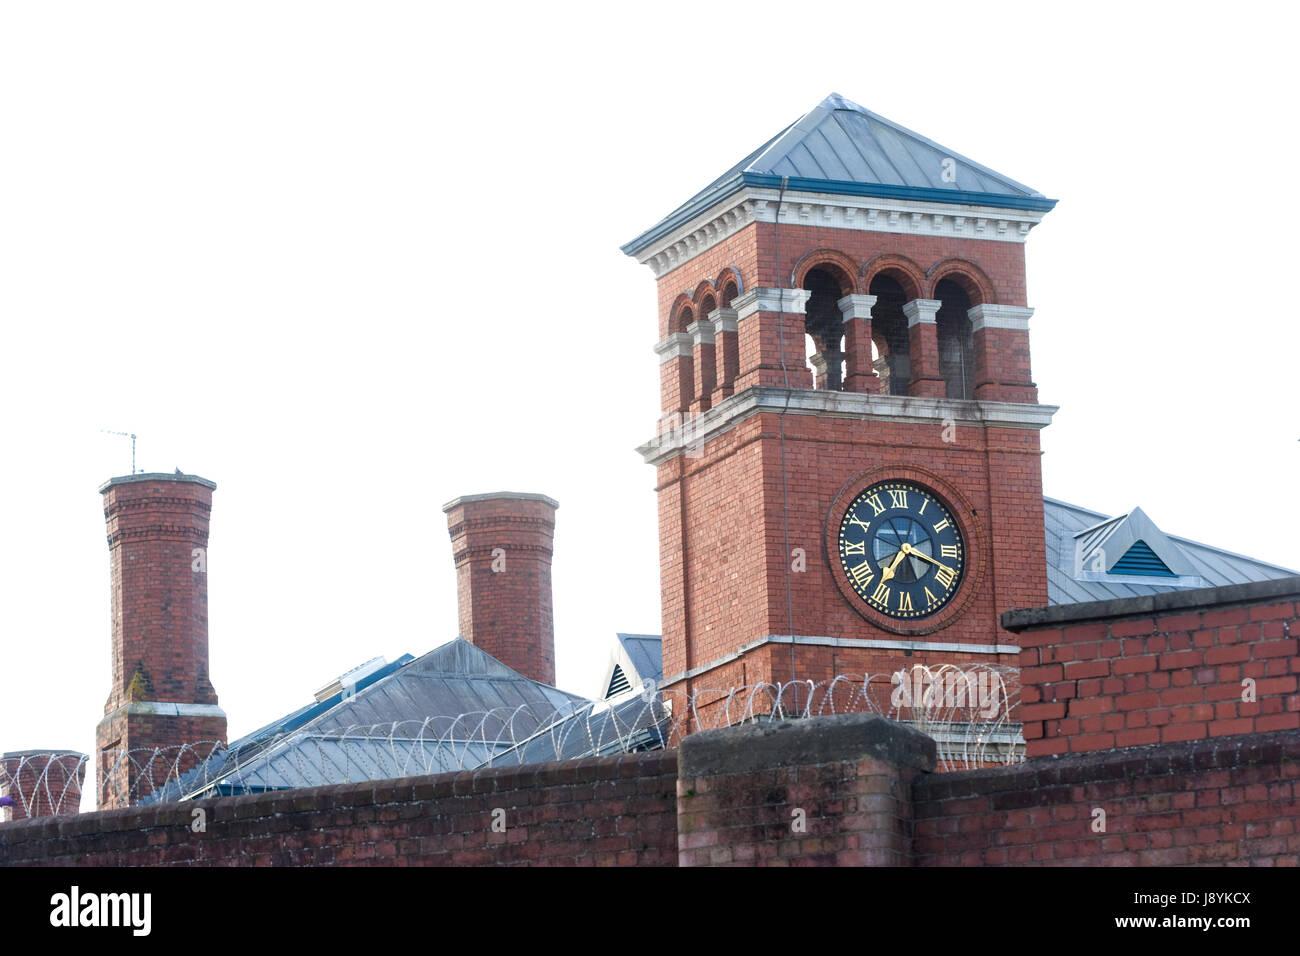 HM Prison Bristol, Horfield, Bristol - Stock Image